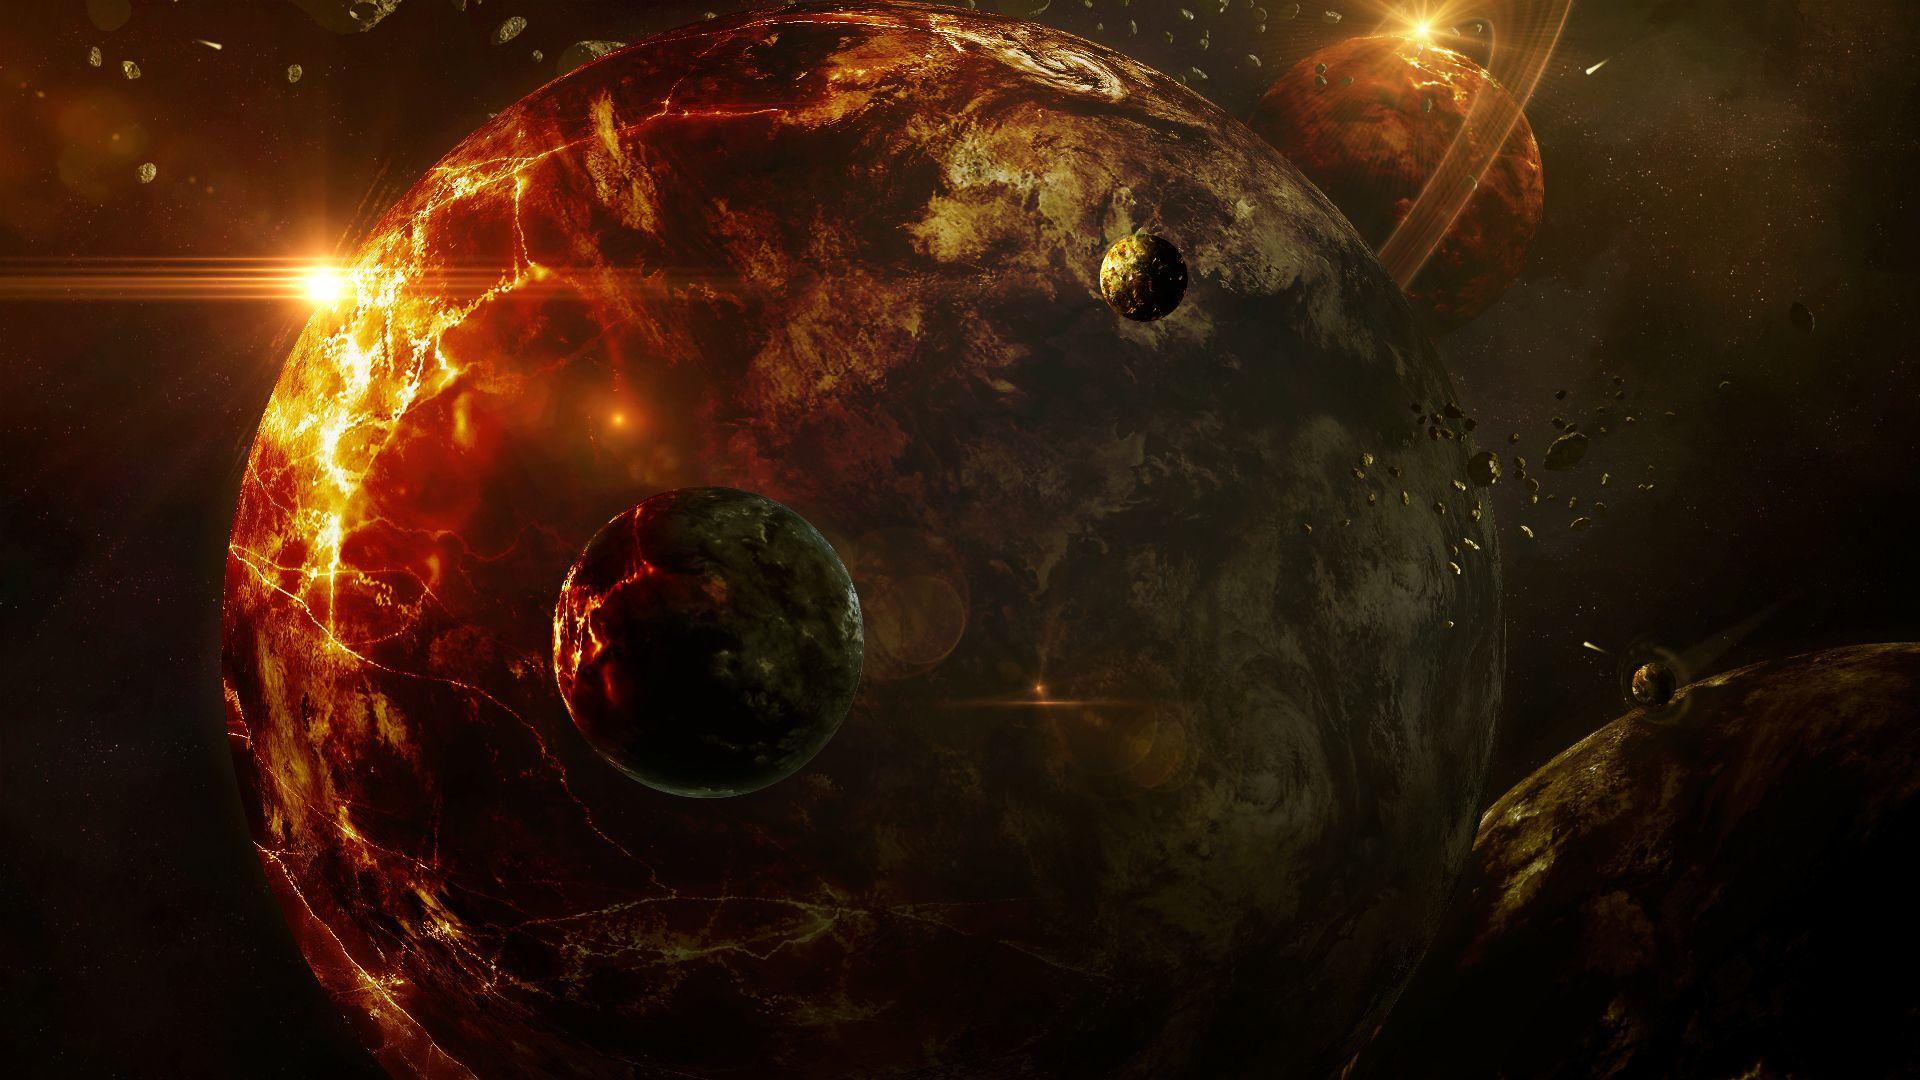 Pillars of Creation Hubble Wallpapers - Top Free Pillars ...